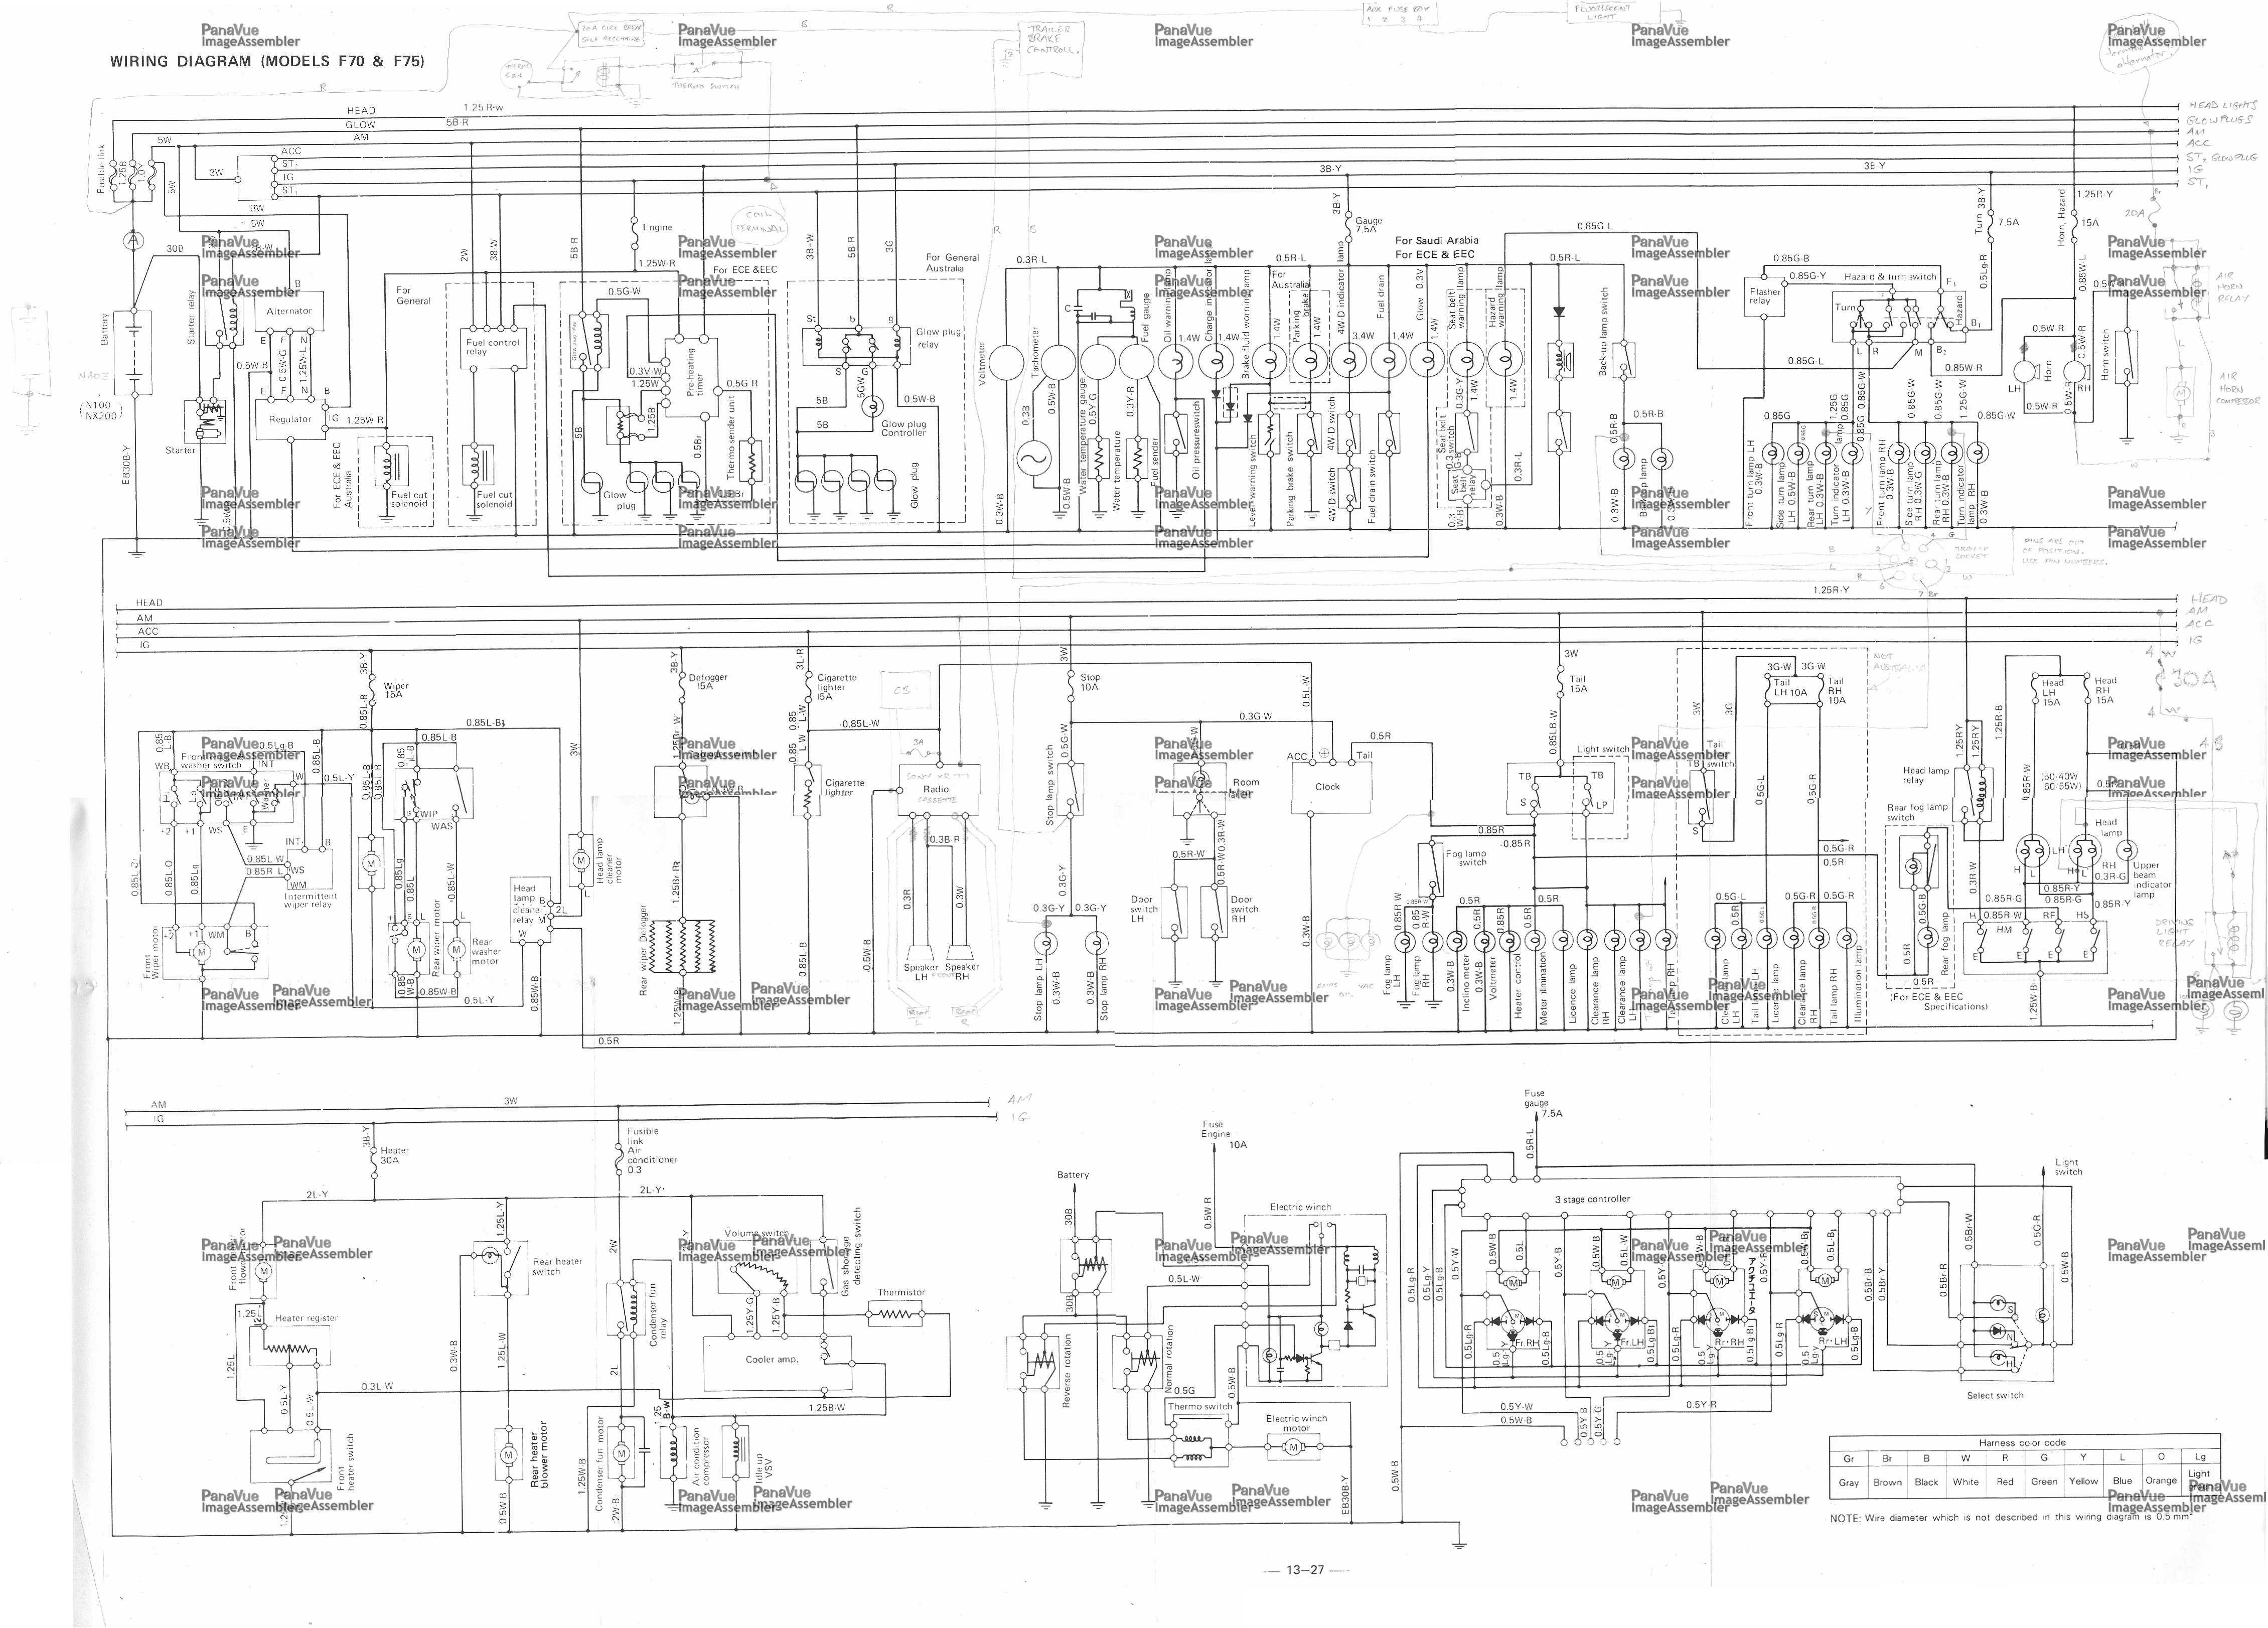 Fiat Multipla Wiring Diagram Pdf Trusted Diagrams Car Air Condition Terrific Doblo Ideas Best Image Rh Cashsigns Us 1969 500